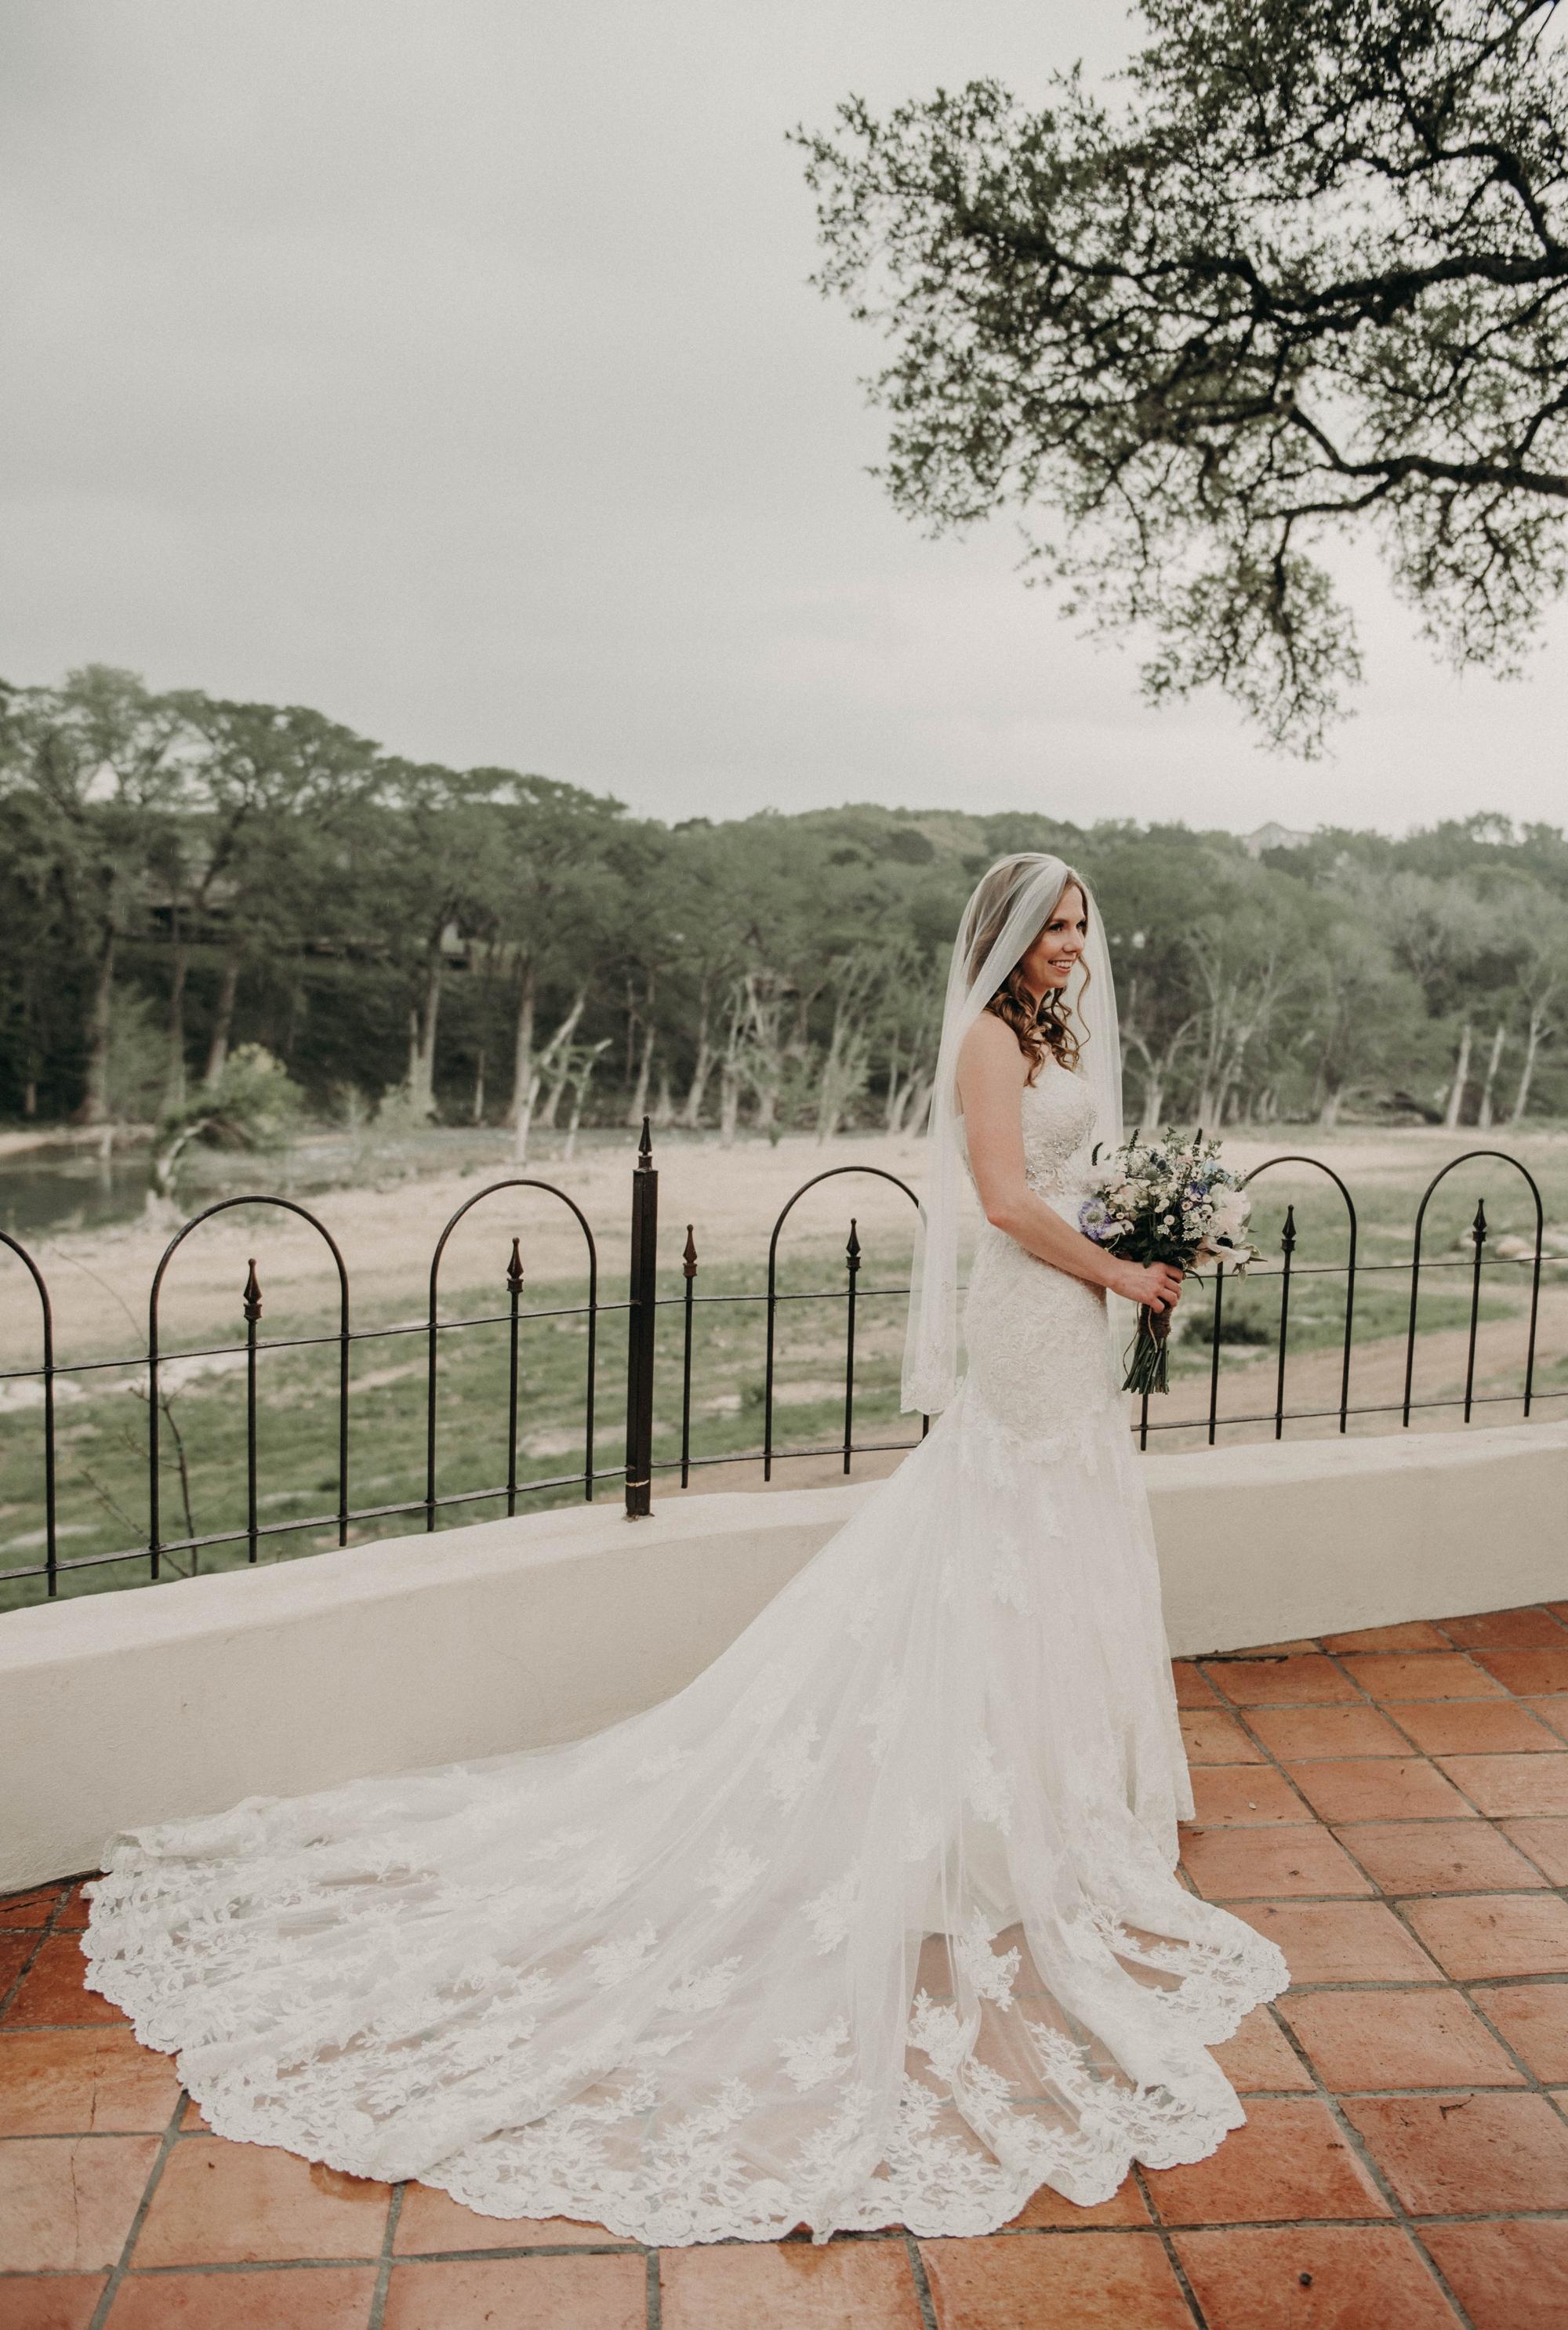 wimberley-texas-wedding-photography-1778-photographie-59.jpg